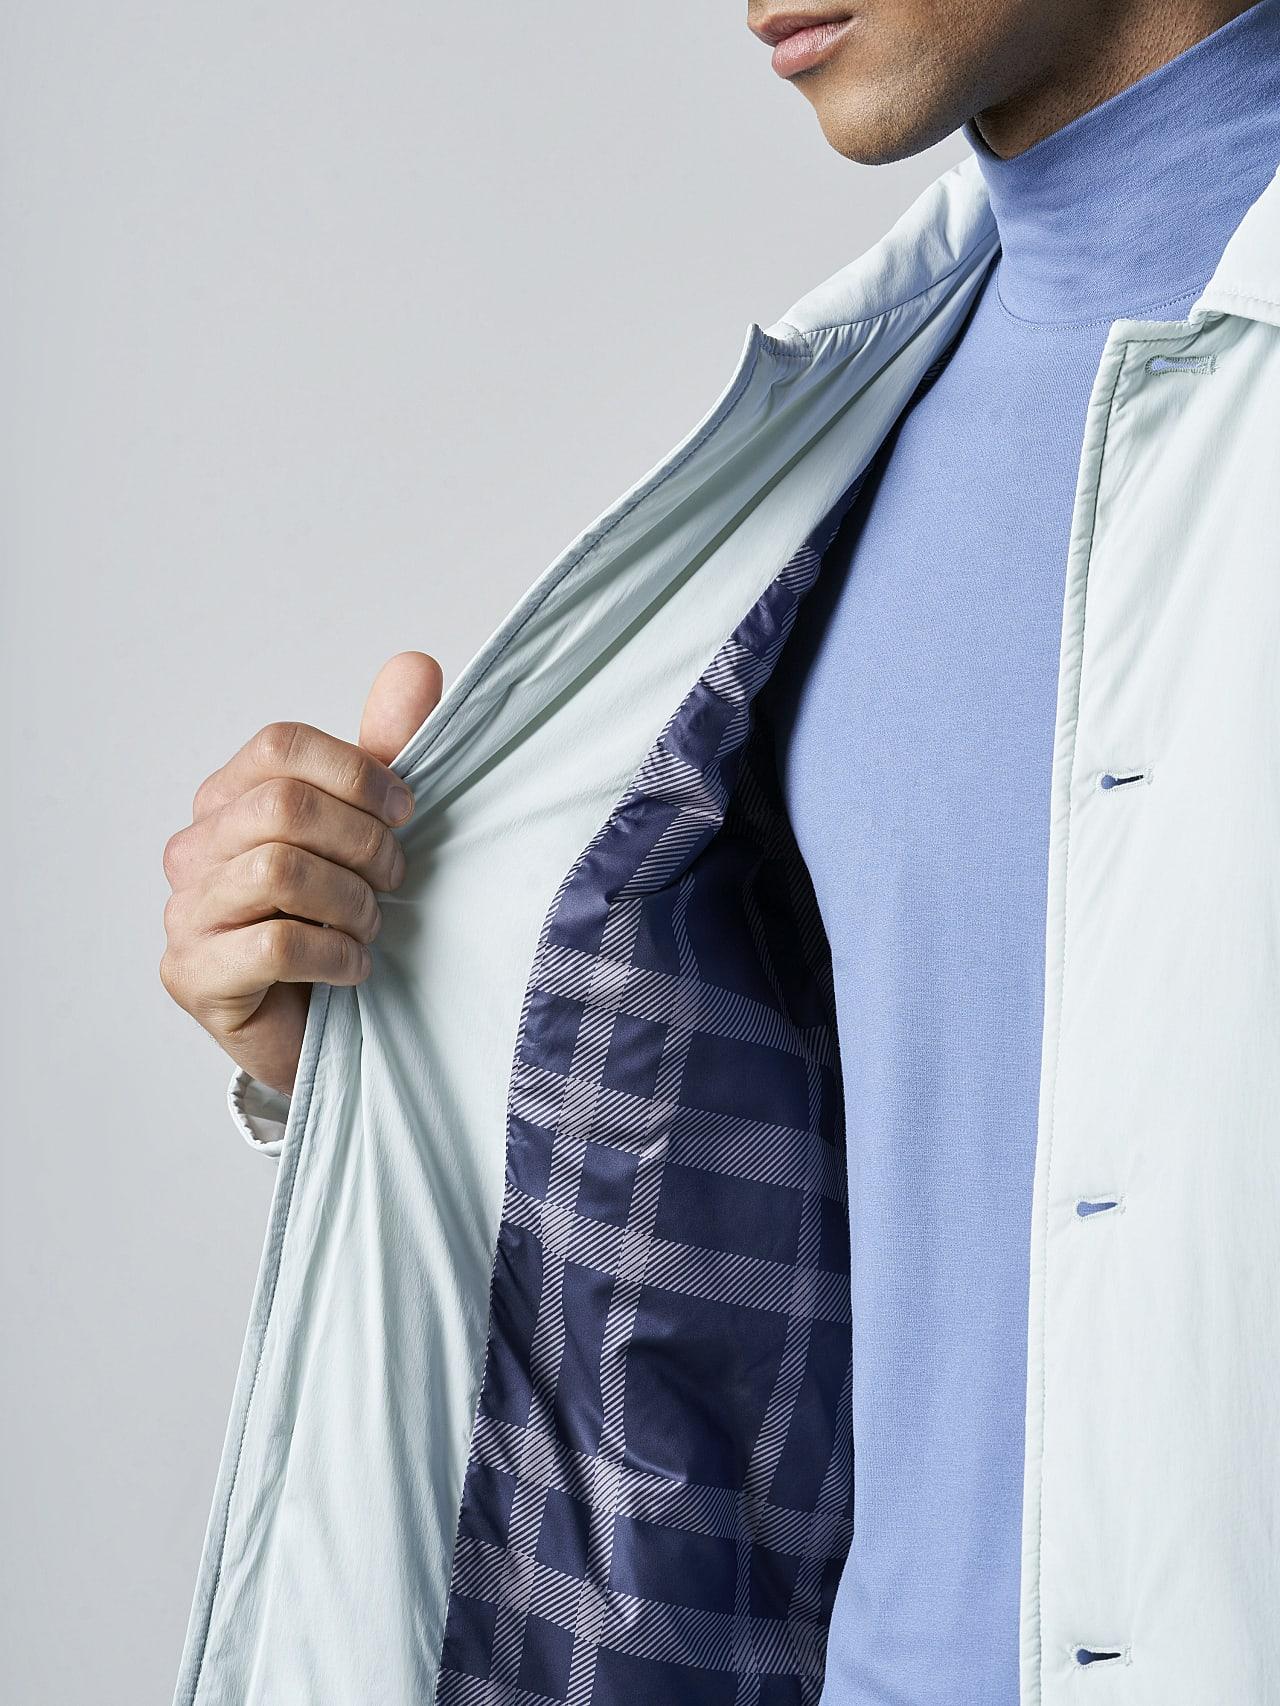 OVASU V1.Y5.02 PrimaLoft® Overshirt Jacket Pale Blue  Right Alpha Tauri